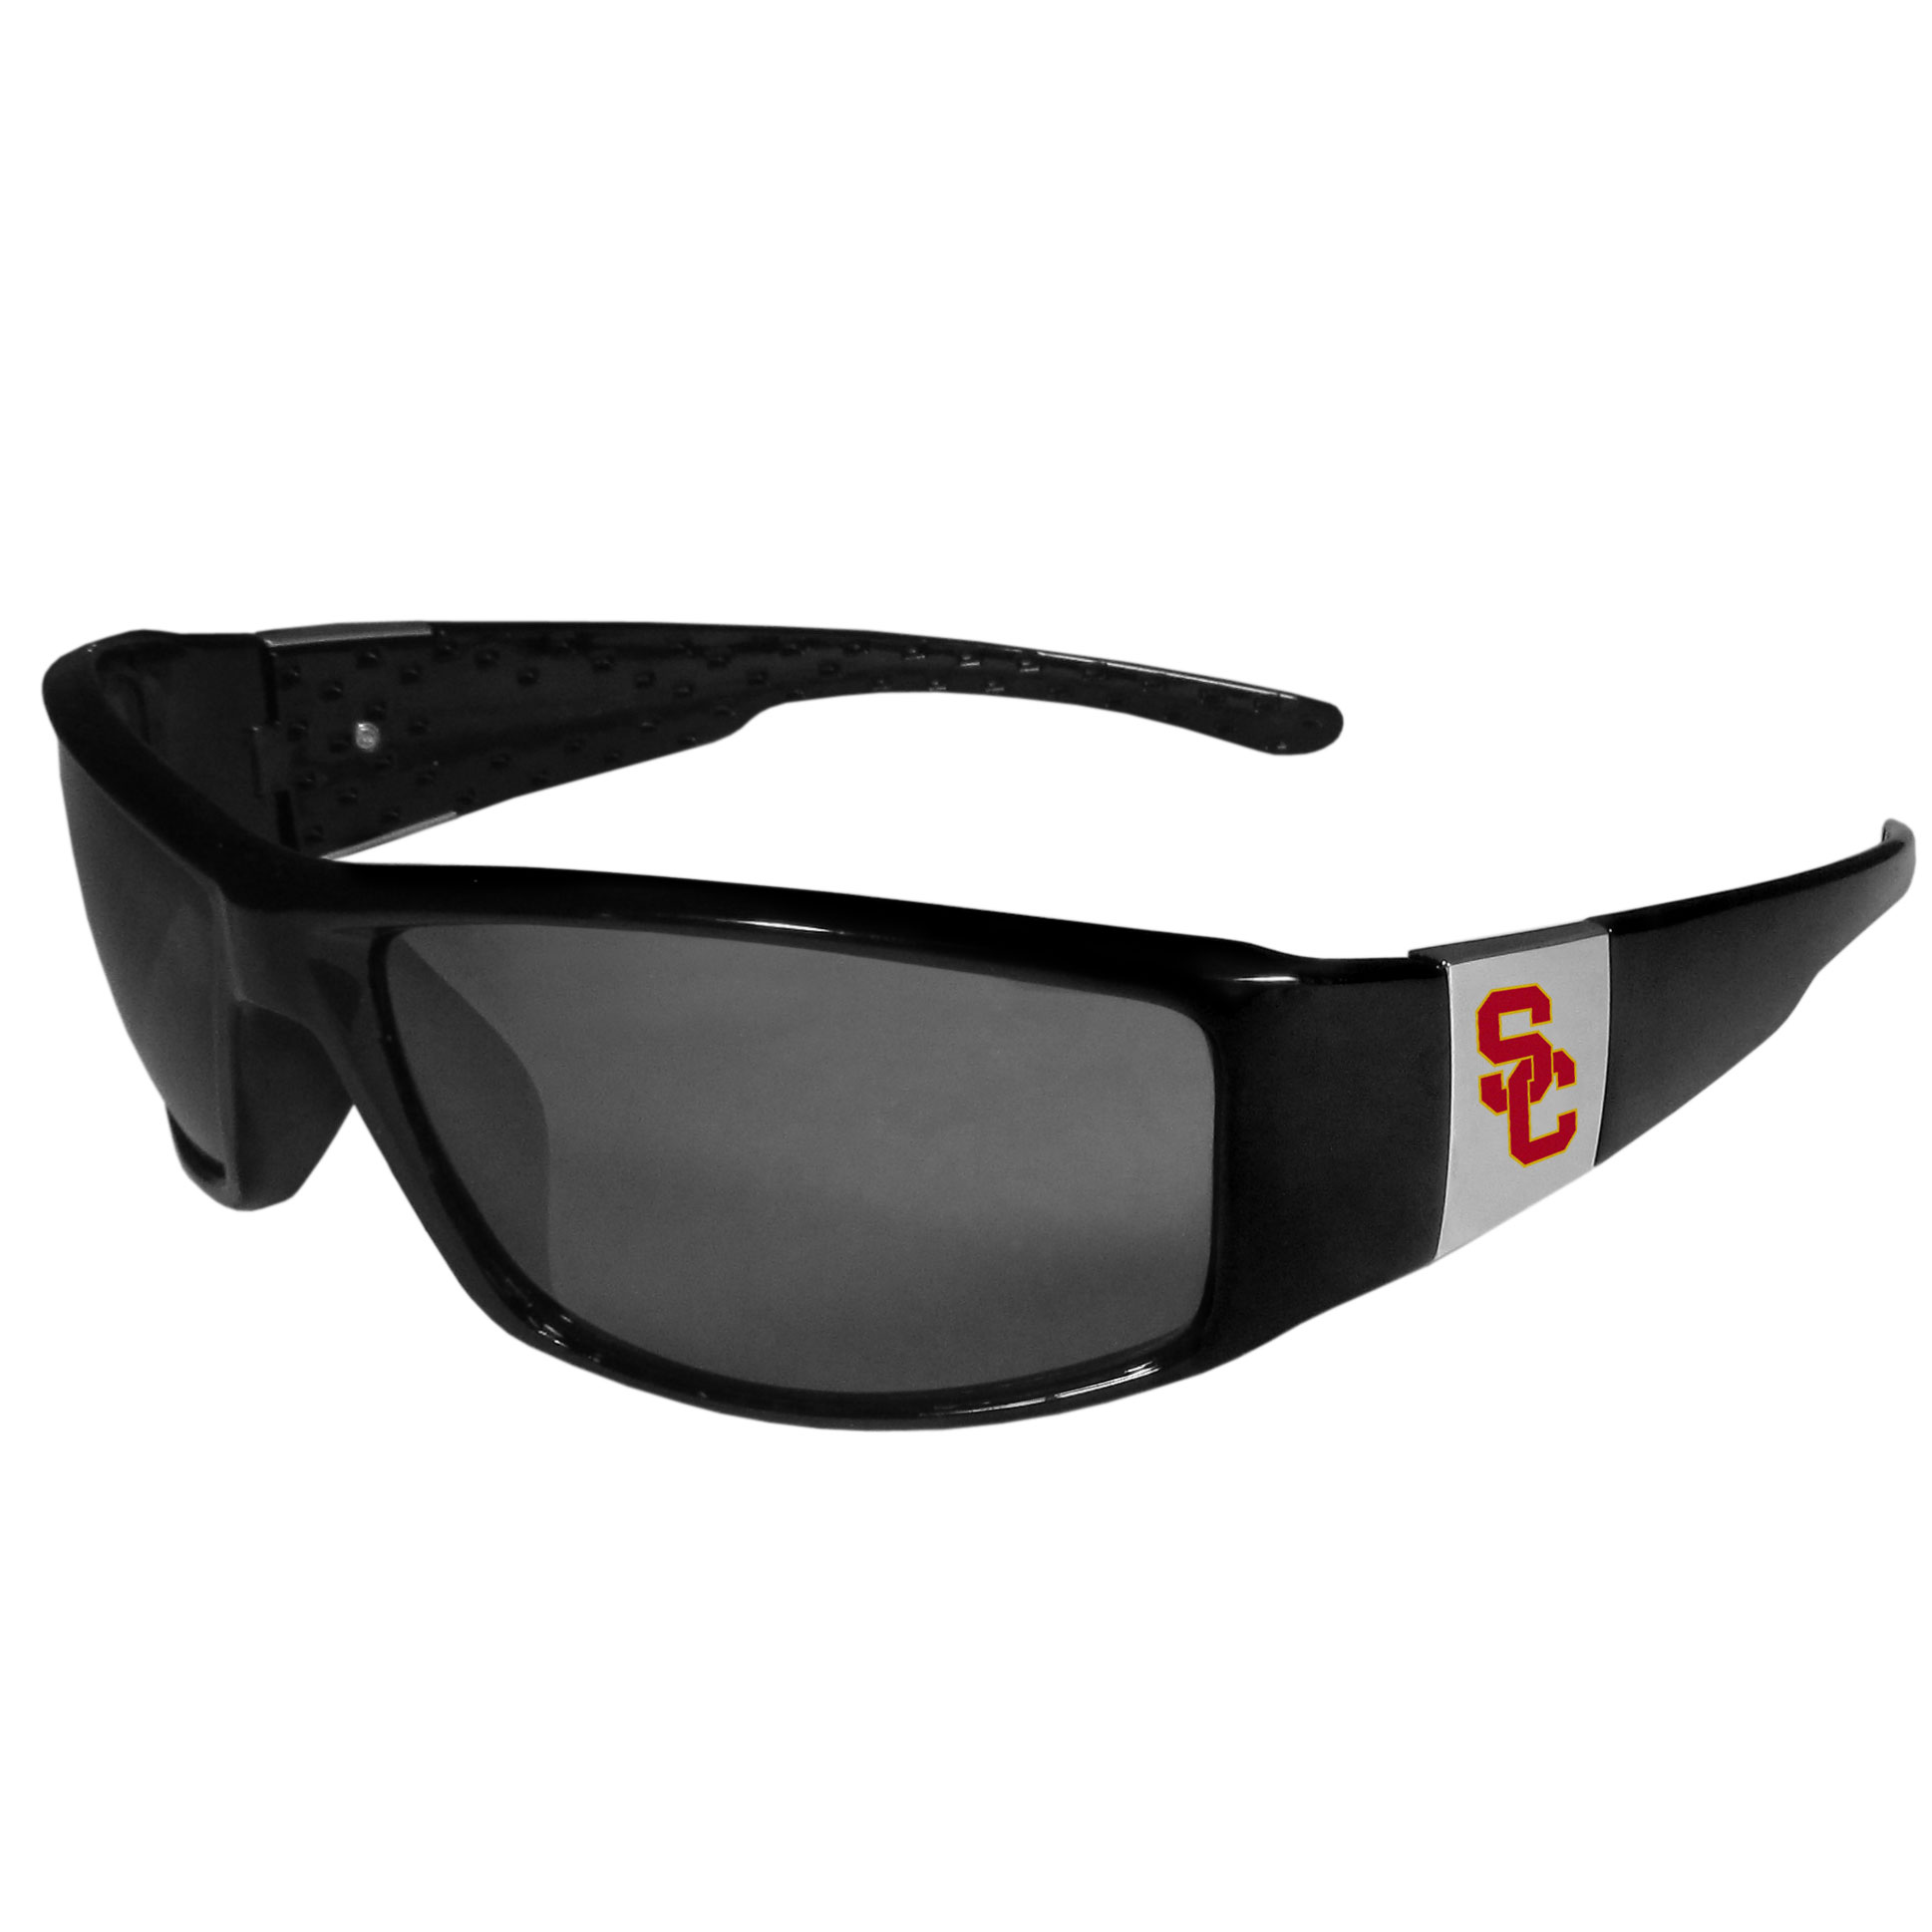 USC Trojans Chrome Wrap Sunglasses with Microfiber Bag NCAA Licensed